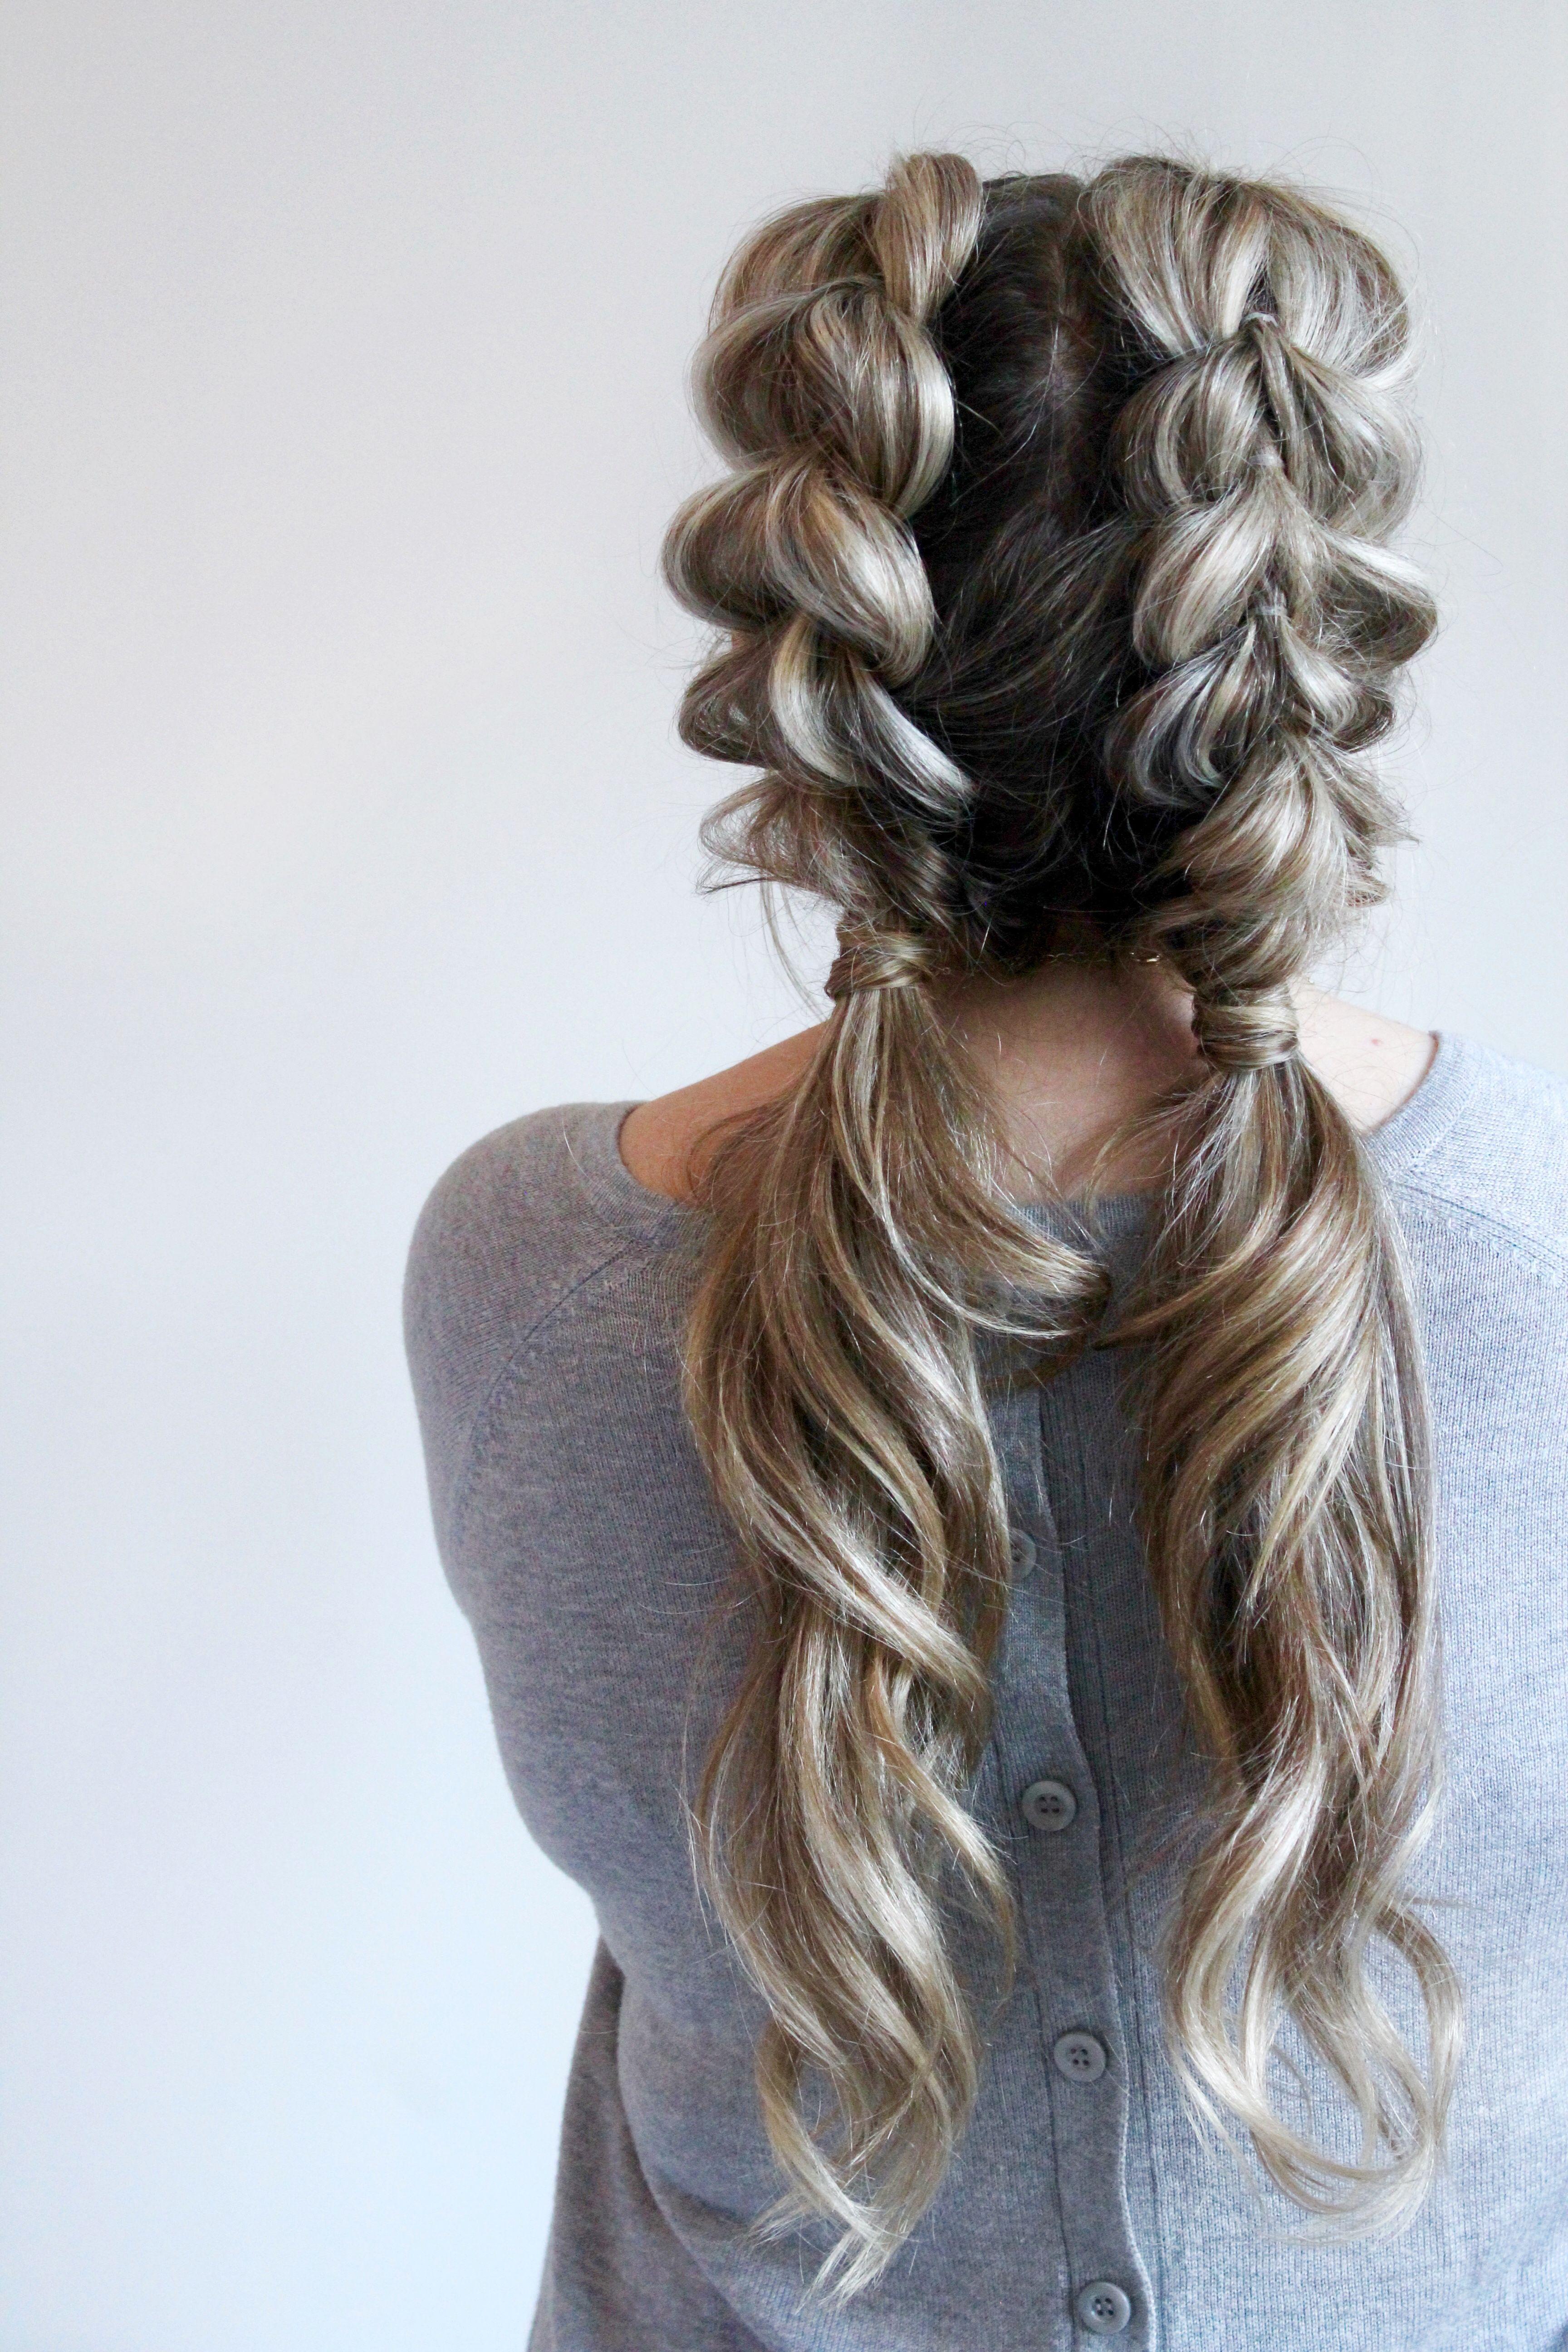 Jumbo pull through braid pigtails tutorial hairstyles pinterest